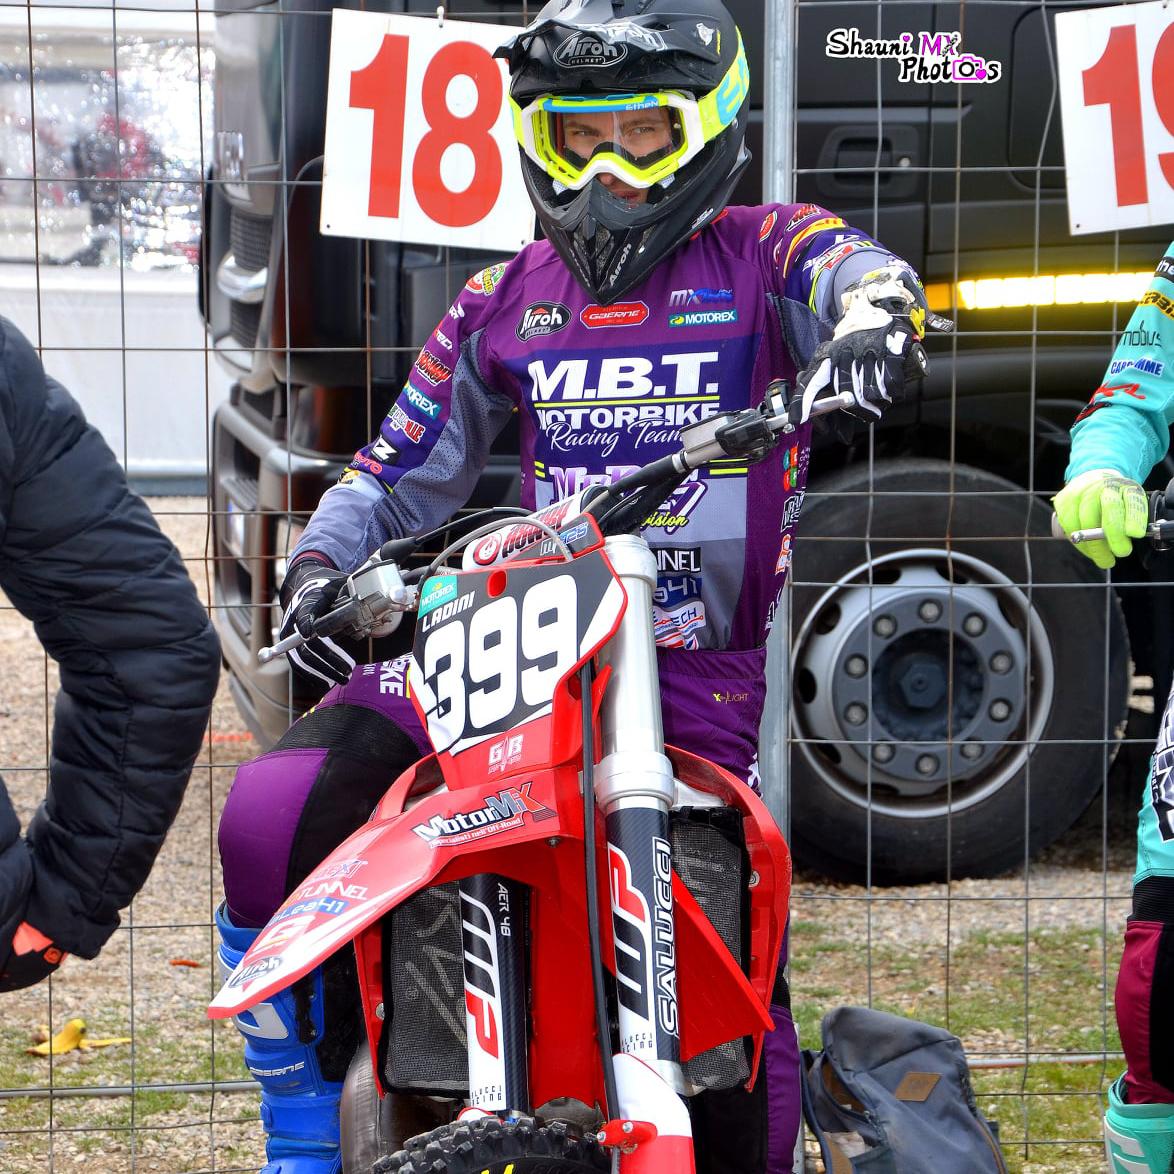 motocross mx 125 moto fuoristrada